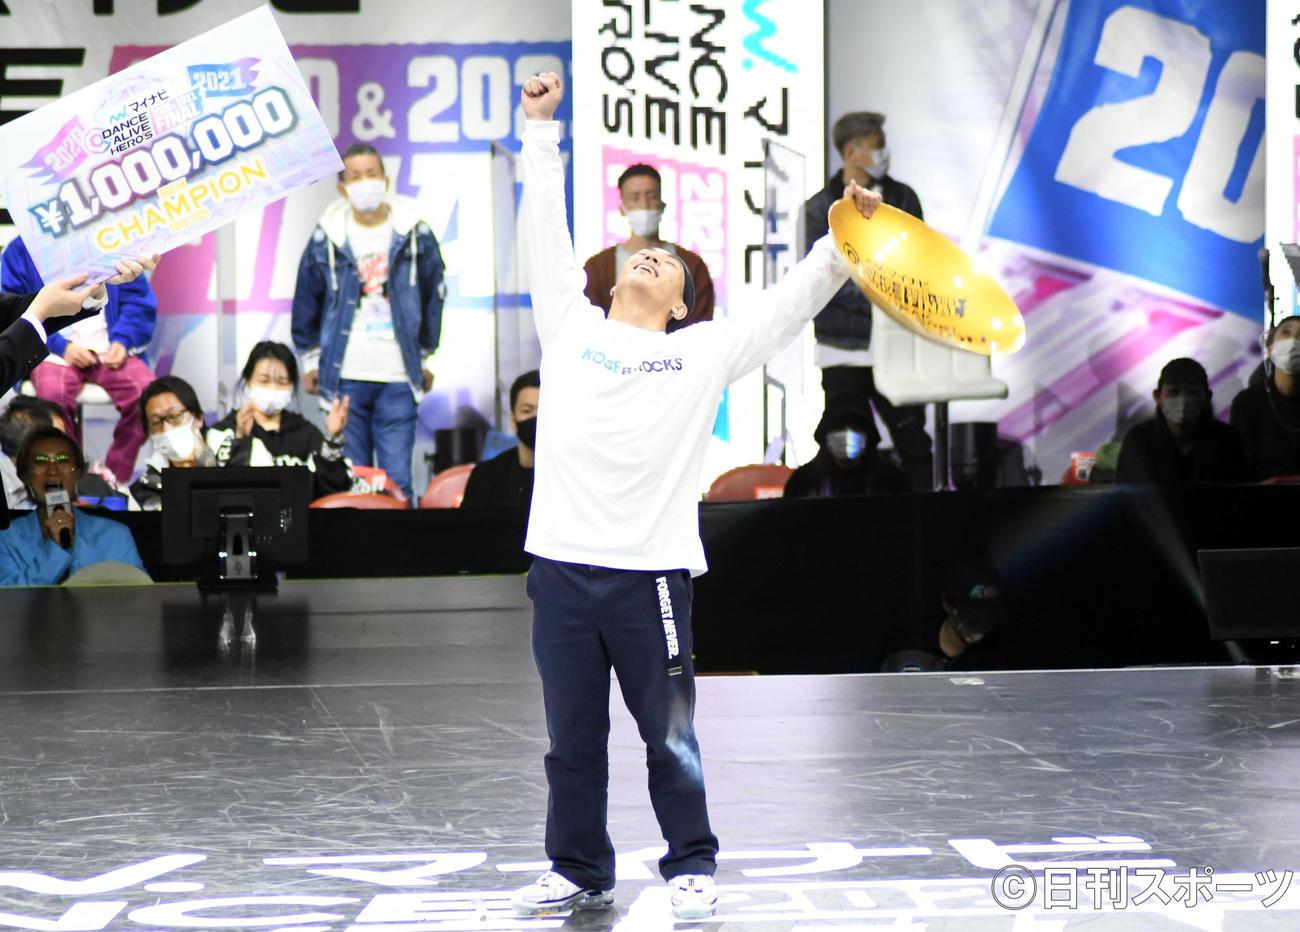 ISSEI「楽しかった」ダンスアライブヒーローズのBREAK部門で優勝